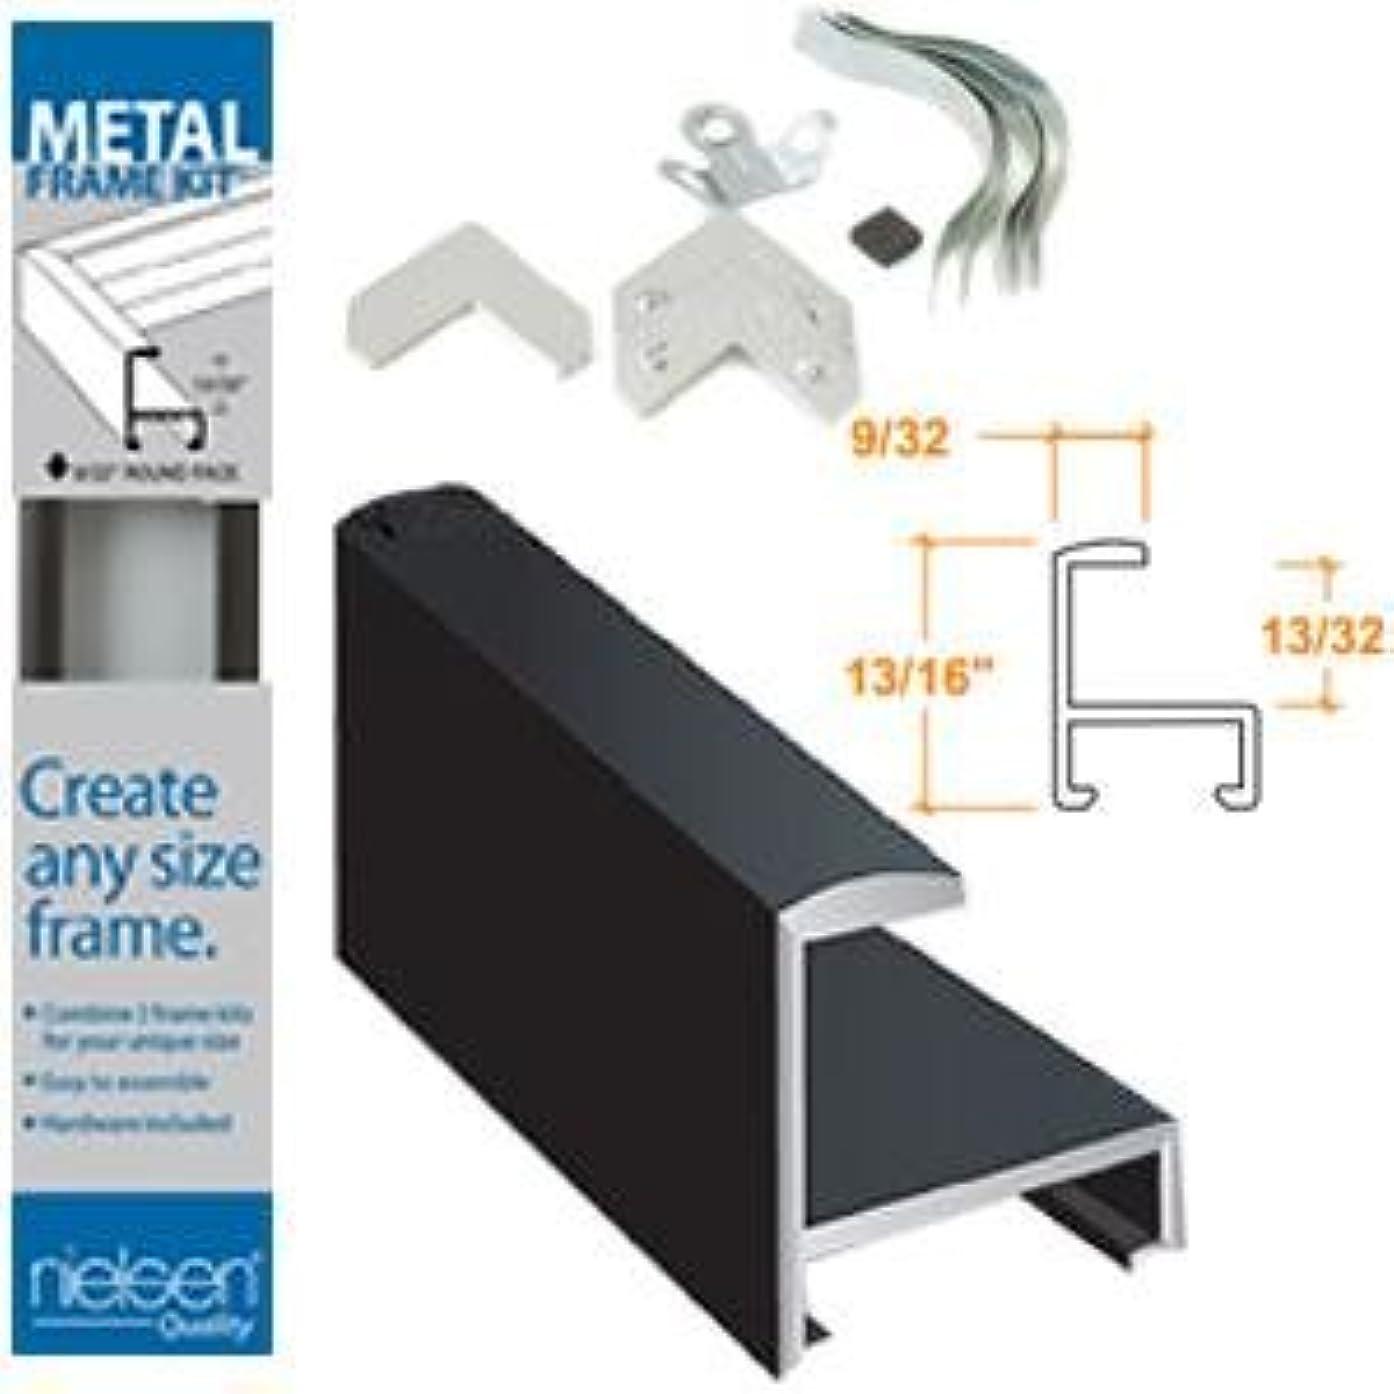 Nielsen Bainbridge Metal Frame Kit black 14 in.